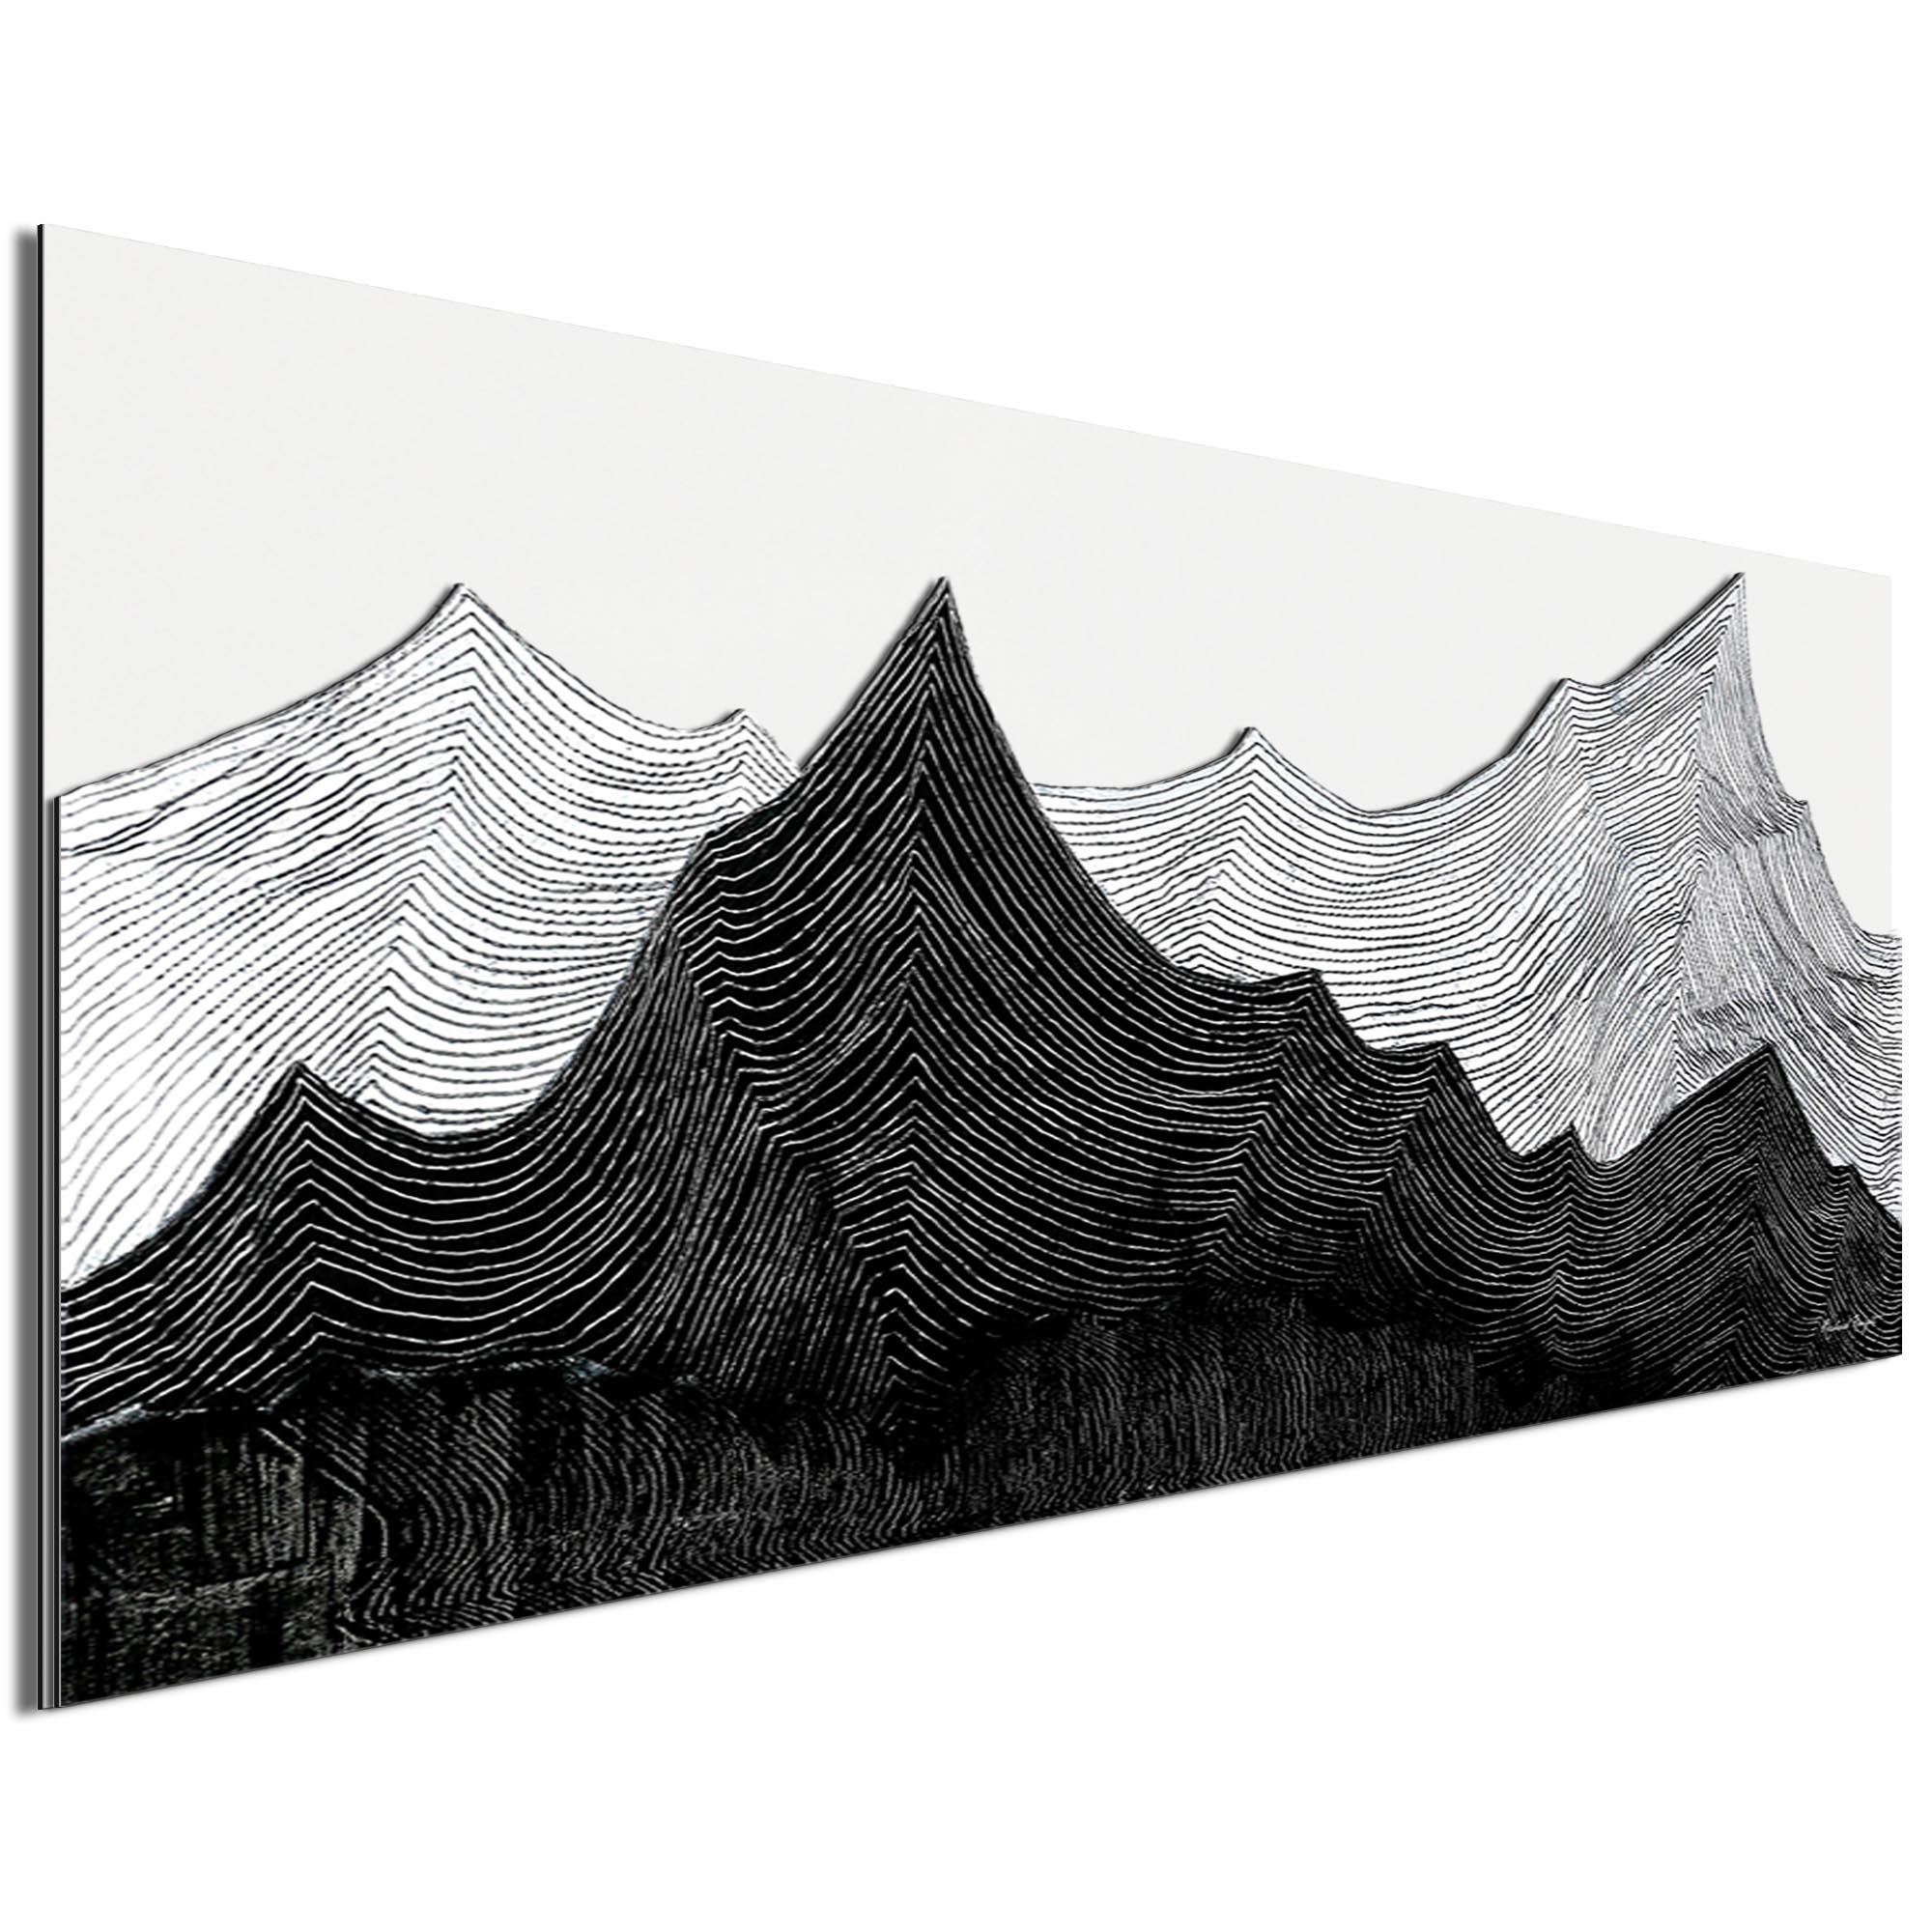 Contrasting Horizon by Richard Knight - Ltd. Ed. Minimalist Abstract Landscape Art - Image 2